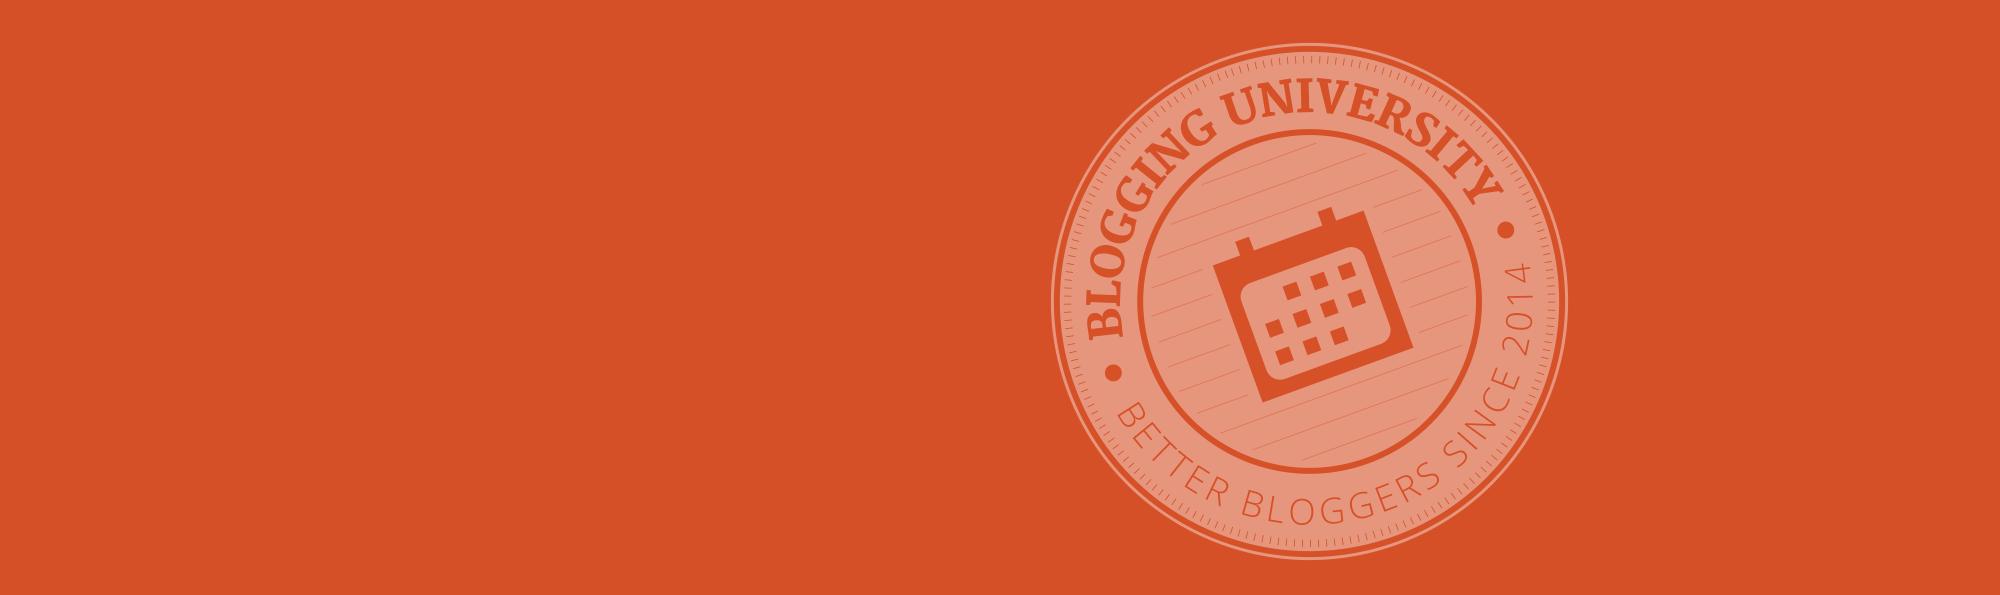 Introducing: Community TAs for Blogging U.